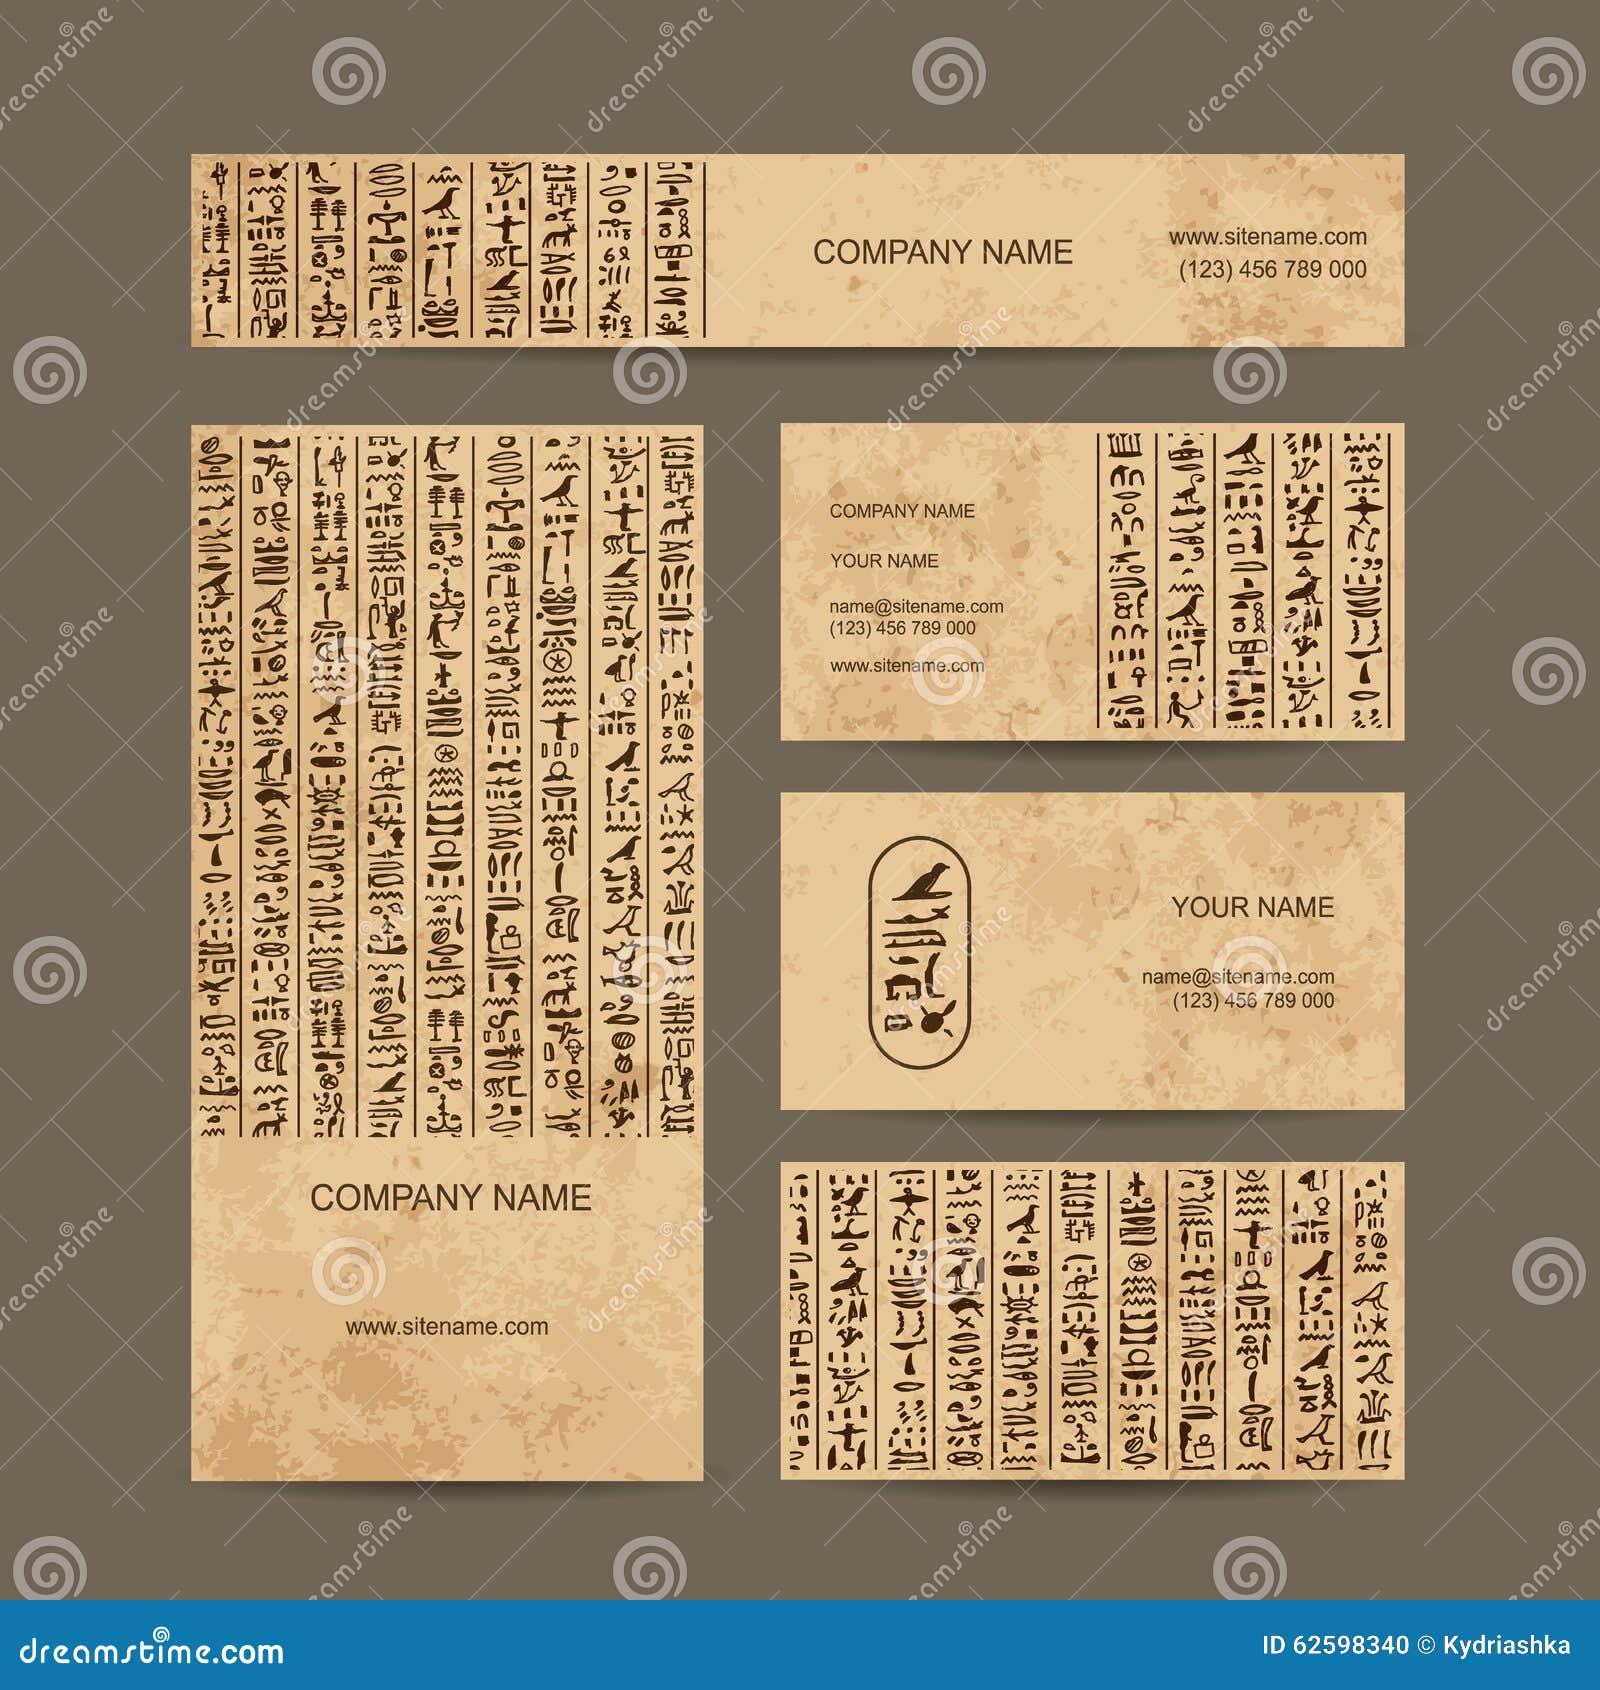 egypt brochure templates - egypt hieroglyphs business cards for your design stock